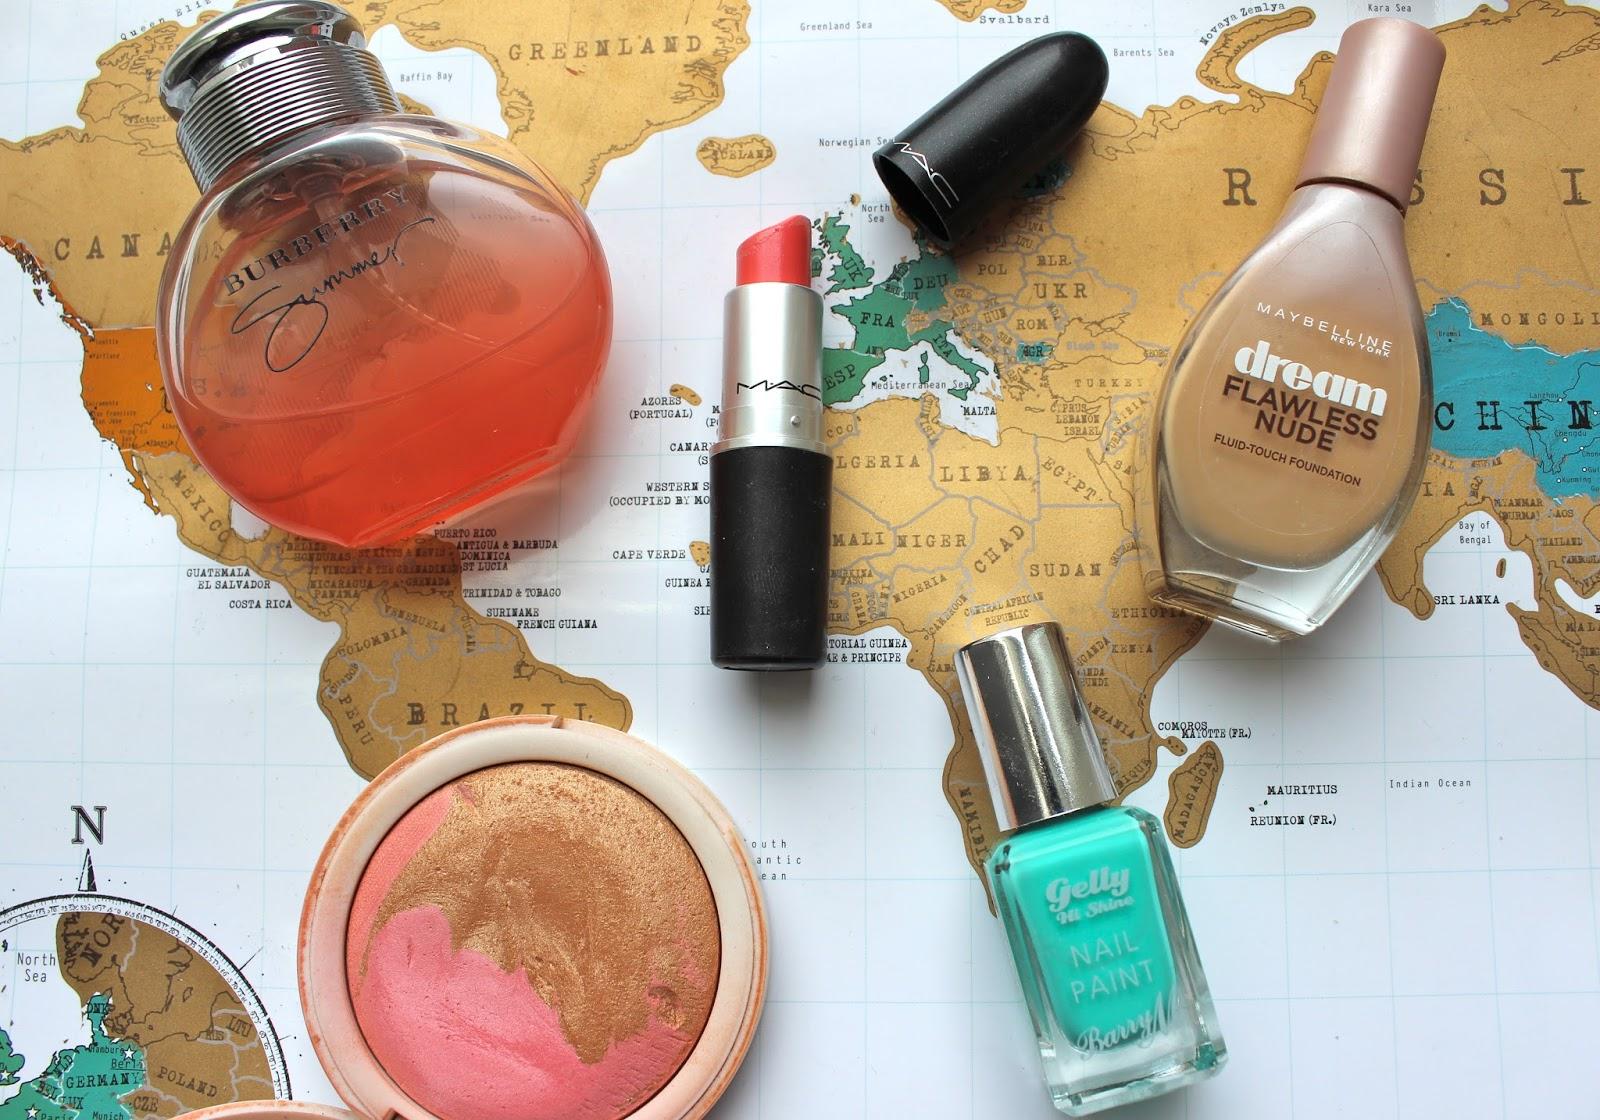 Guest Post: 5 Summer Beauty Essentials from Hello Tasha